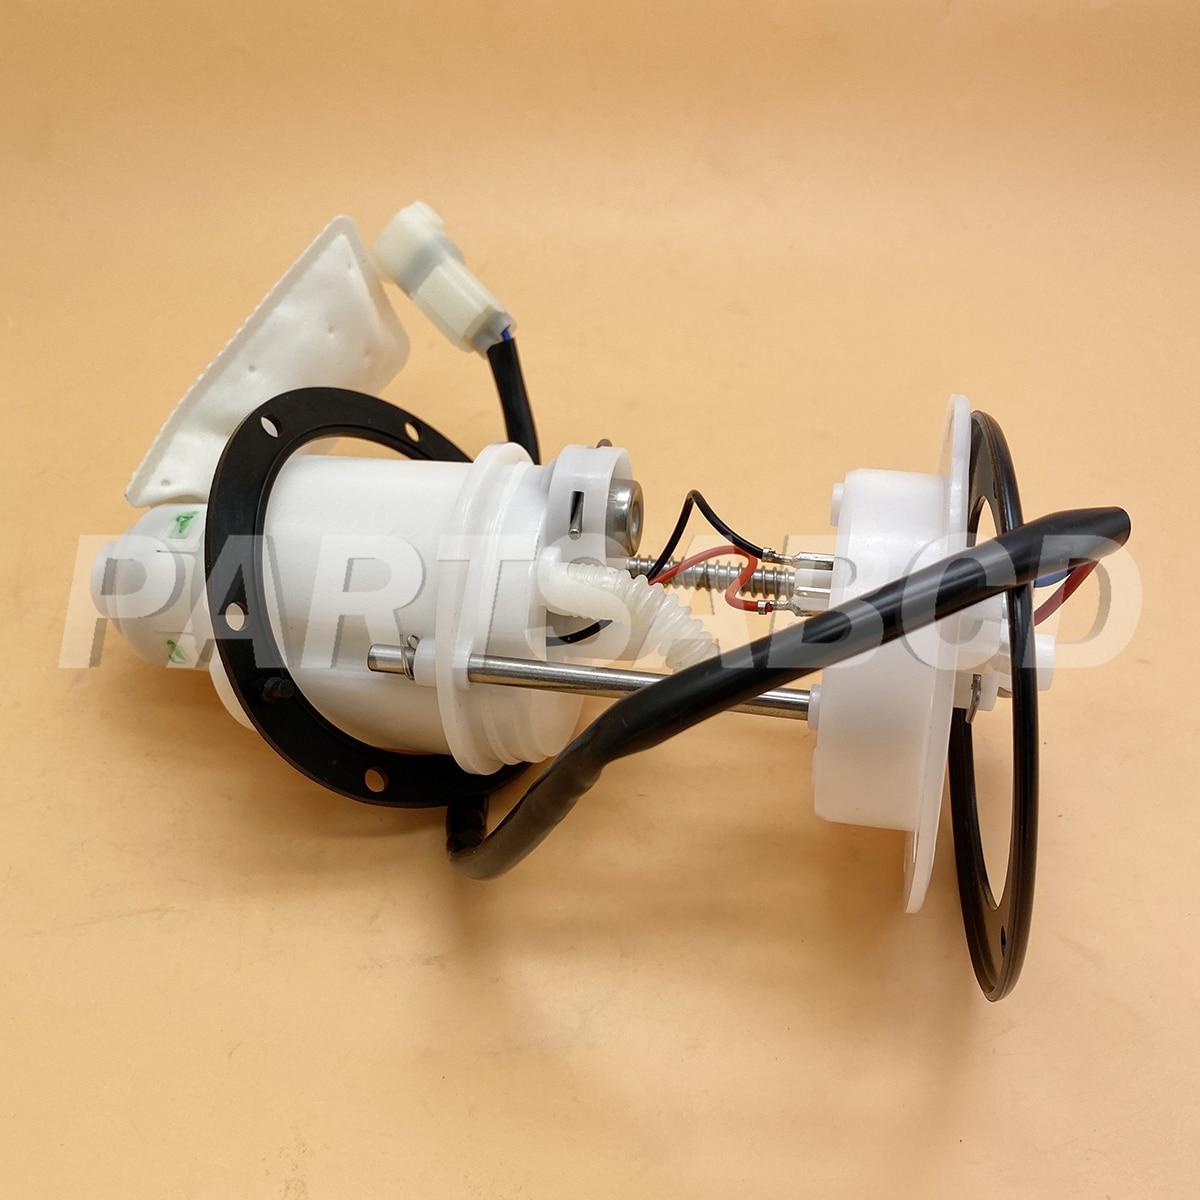 Yslmotor FUEL PUMP FOR CFMOTO CF ATV CFORCE CF500 CF600 CF400S CF500S 500 400 800 OEM#.901F-150900-10000 901F-150900 901F150900